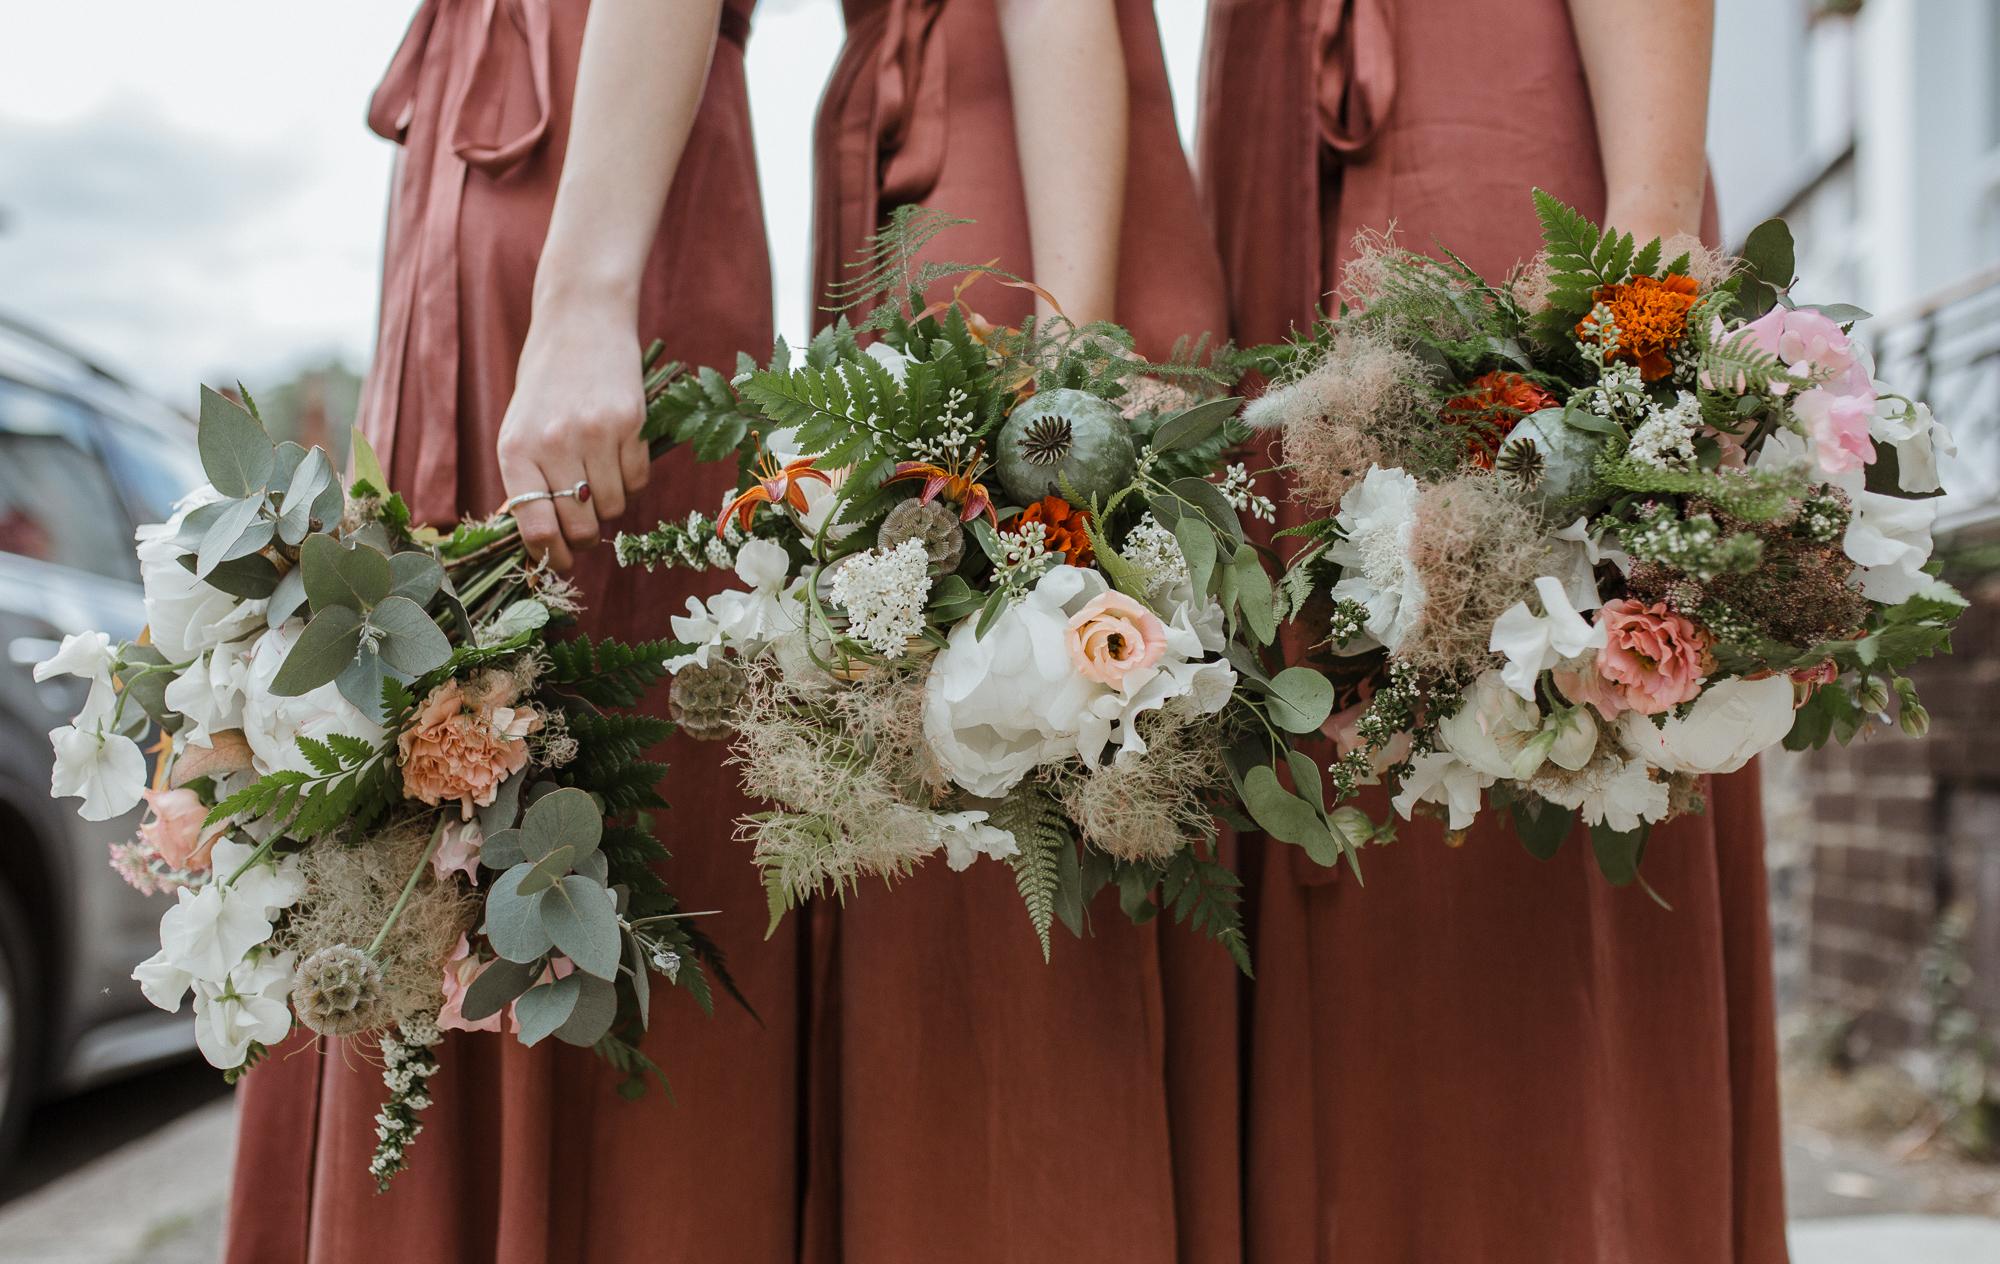 stephanie-green-wedding-photography-sulaflowers-sula-flowers-london-islington-town-hall-depot-n7-55.jpg